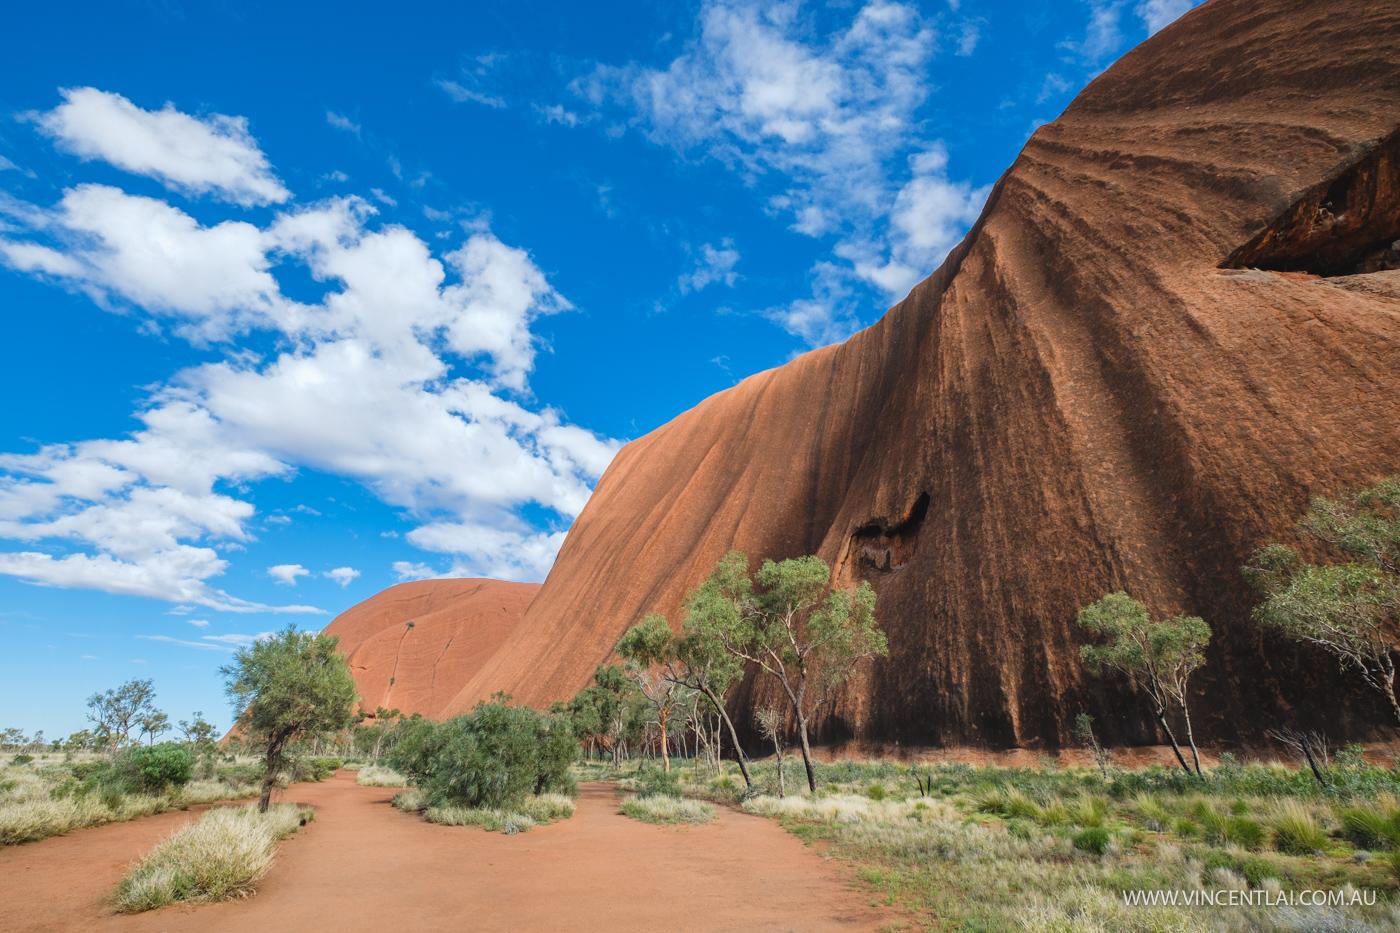 base walk around Uluru